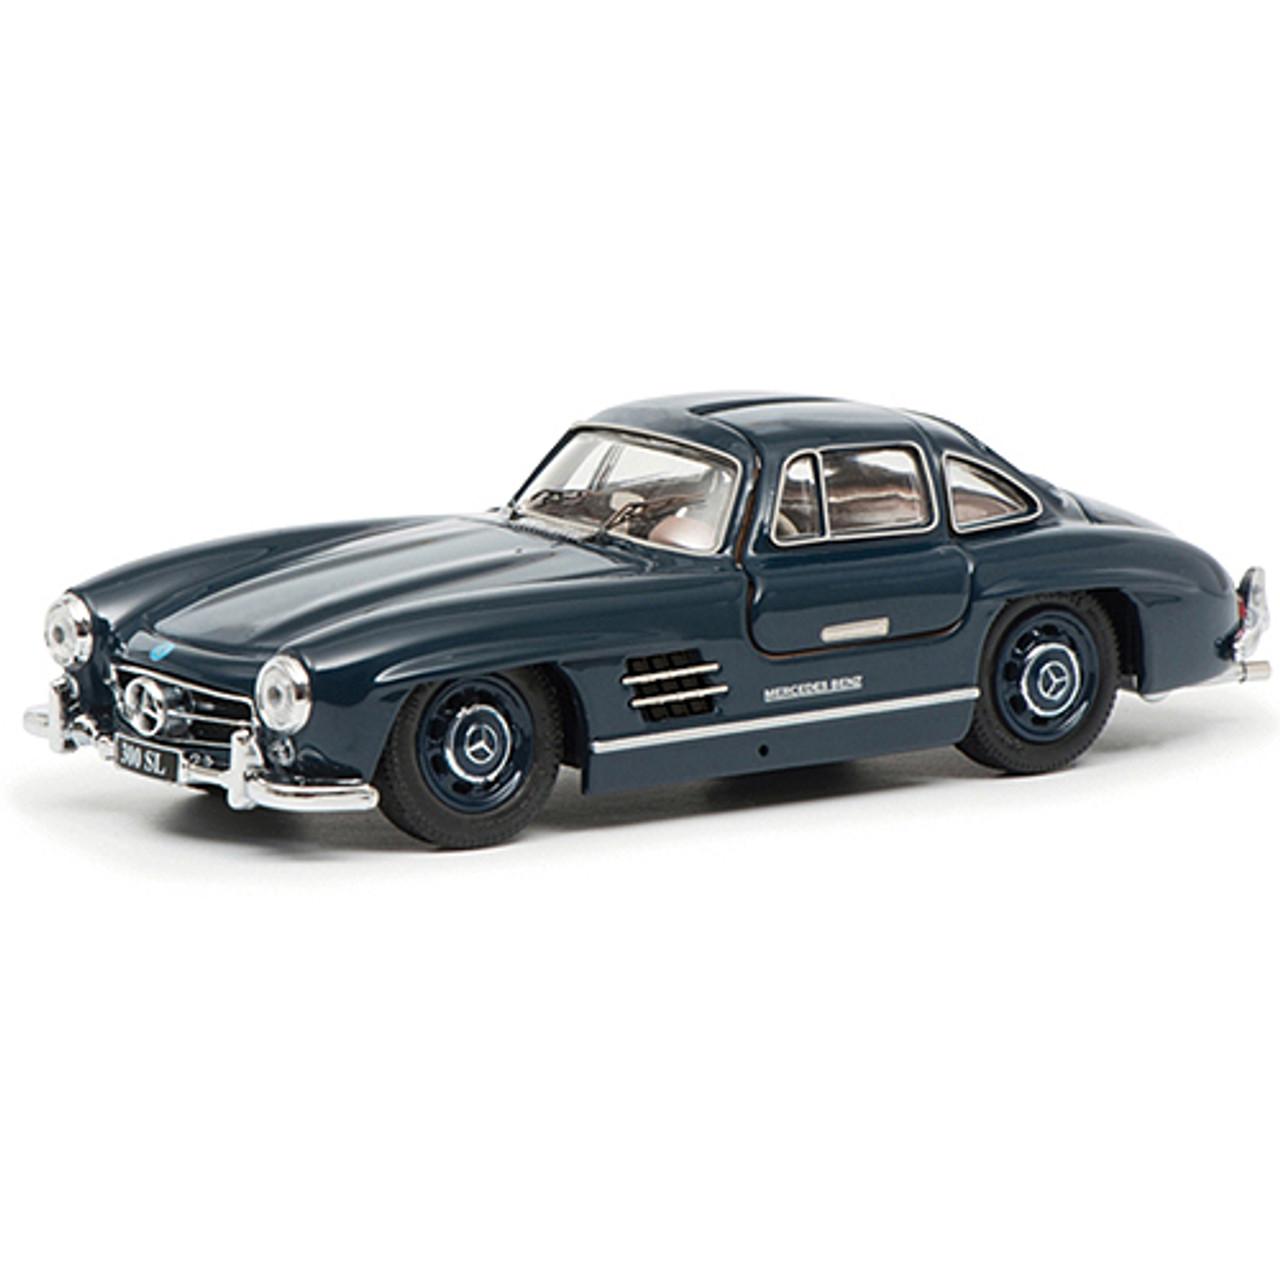 OVP 25340 Mercedes 300 SL Gullwing silber-schwarz 1:87 Schuco neu